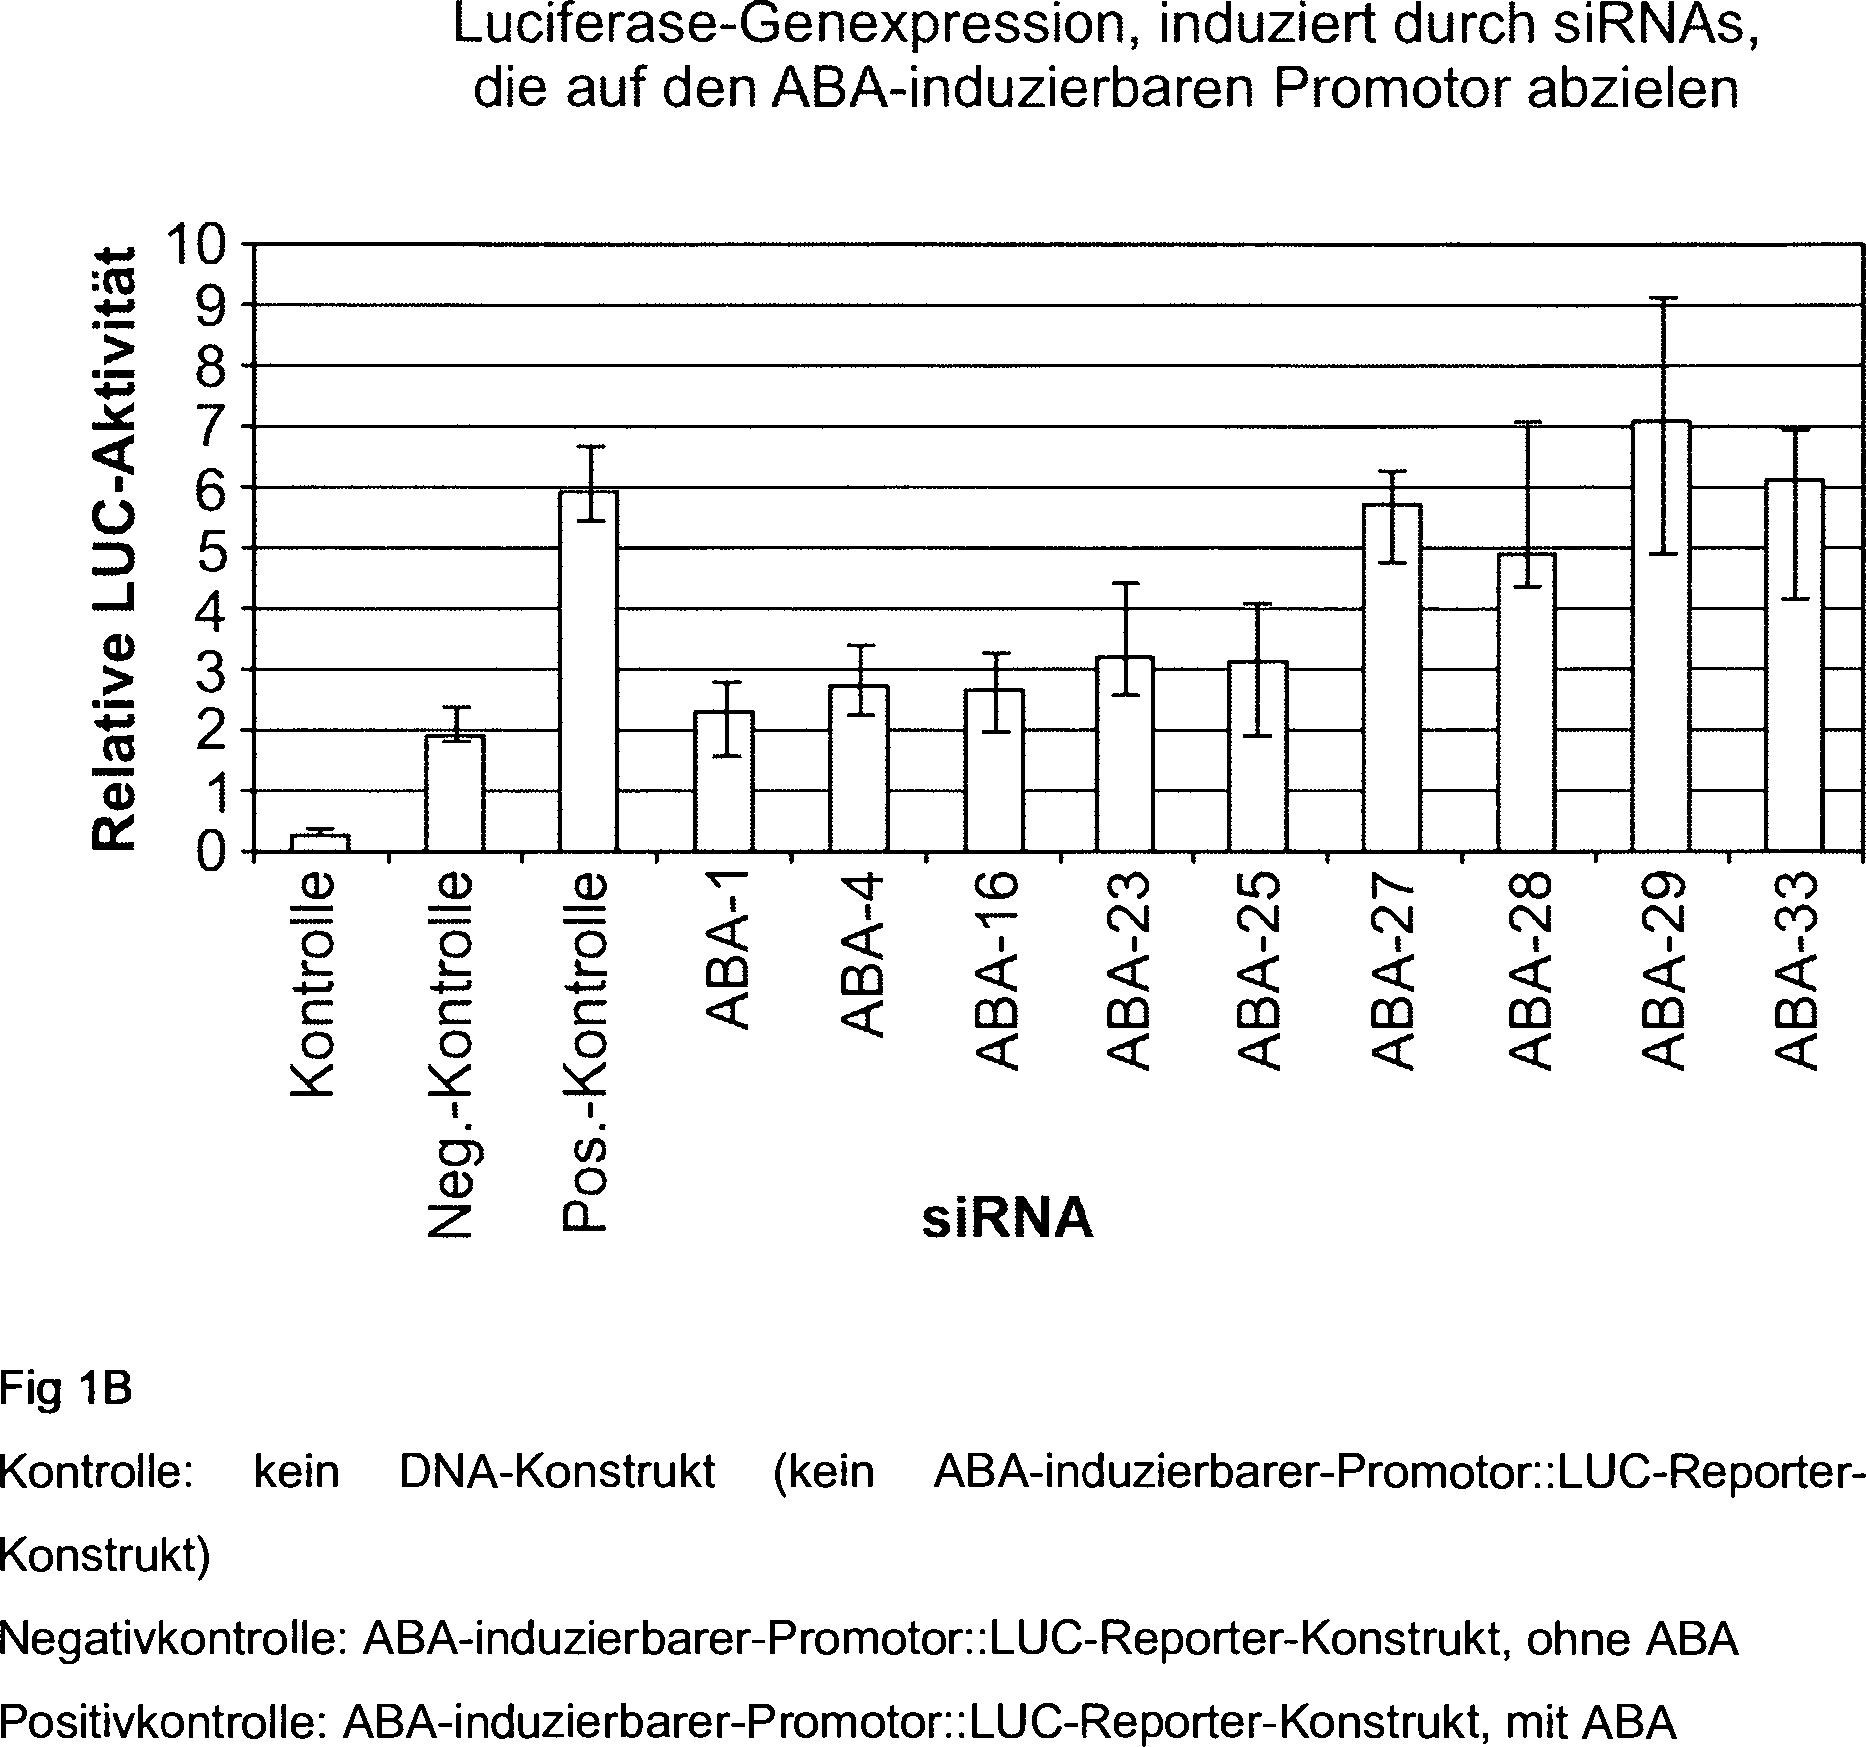 特許 DE112010001705T5 - RNA-vermittelte lnduktion von Genexpression ...